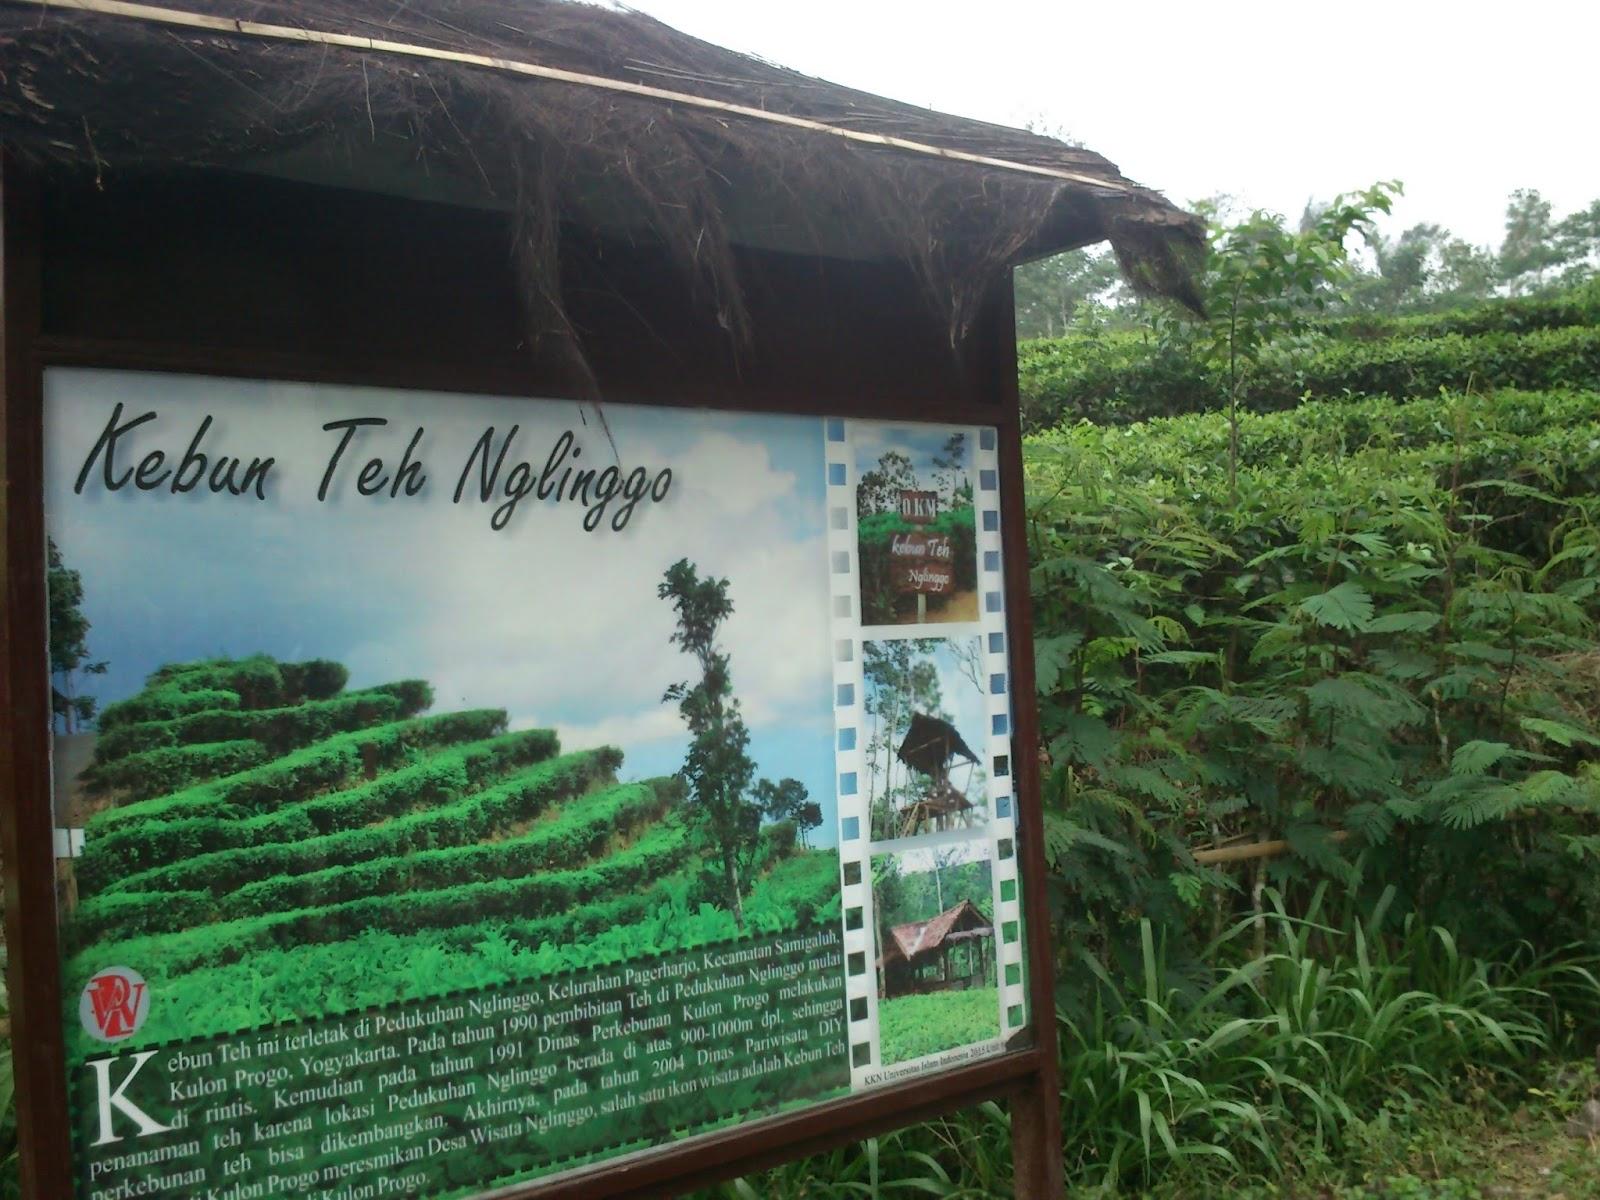 Kebun Teh Nglinggo Kulonprogo Mbolangyuks Kota Yogyakarta